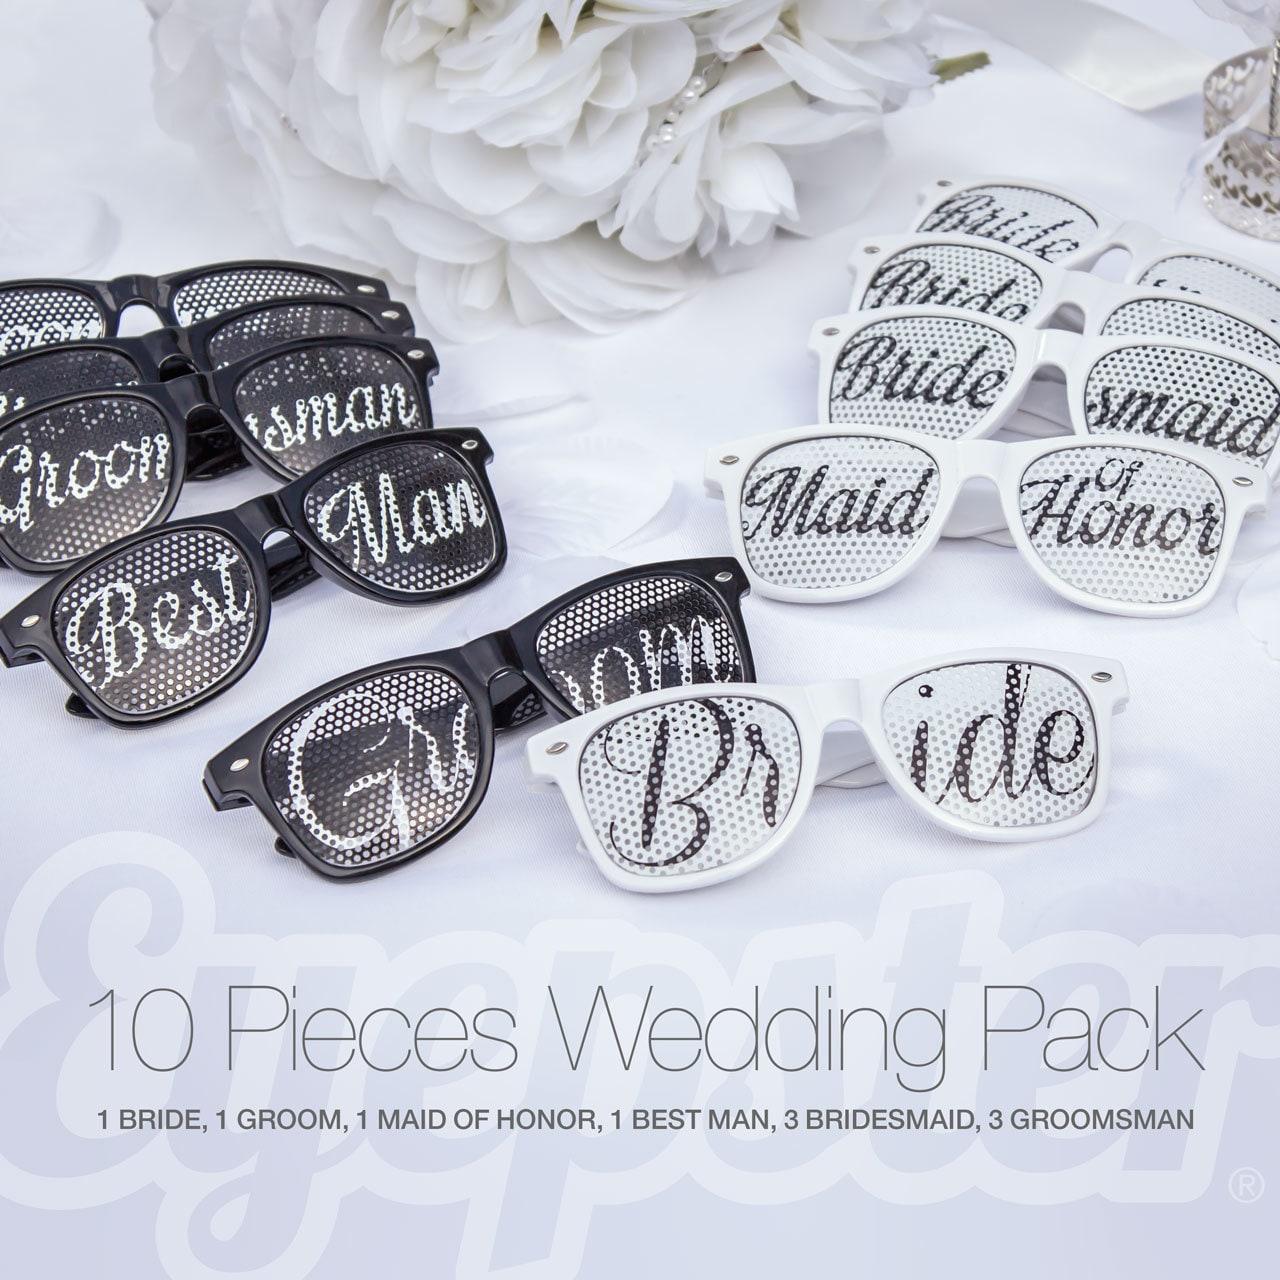 10pcs Retro Party WEDDING SUNGLASSES PACK (Bride, Groom, Maid of Honor, Best Man, Bridesmaid, Groomsman)